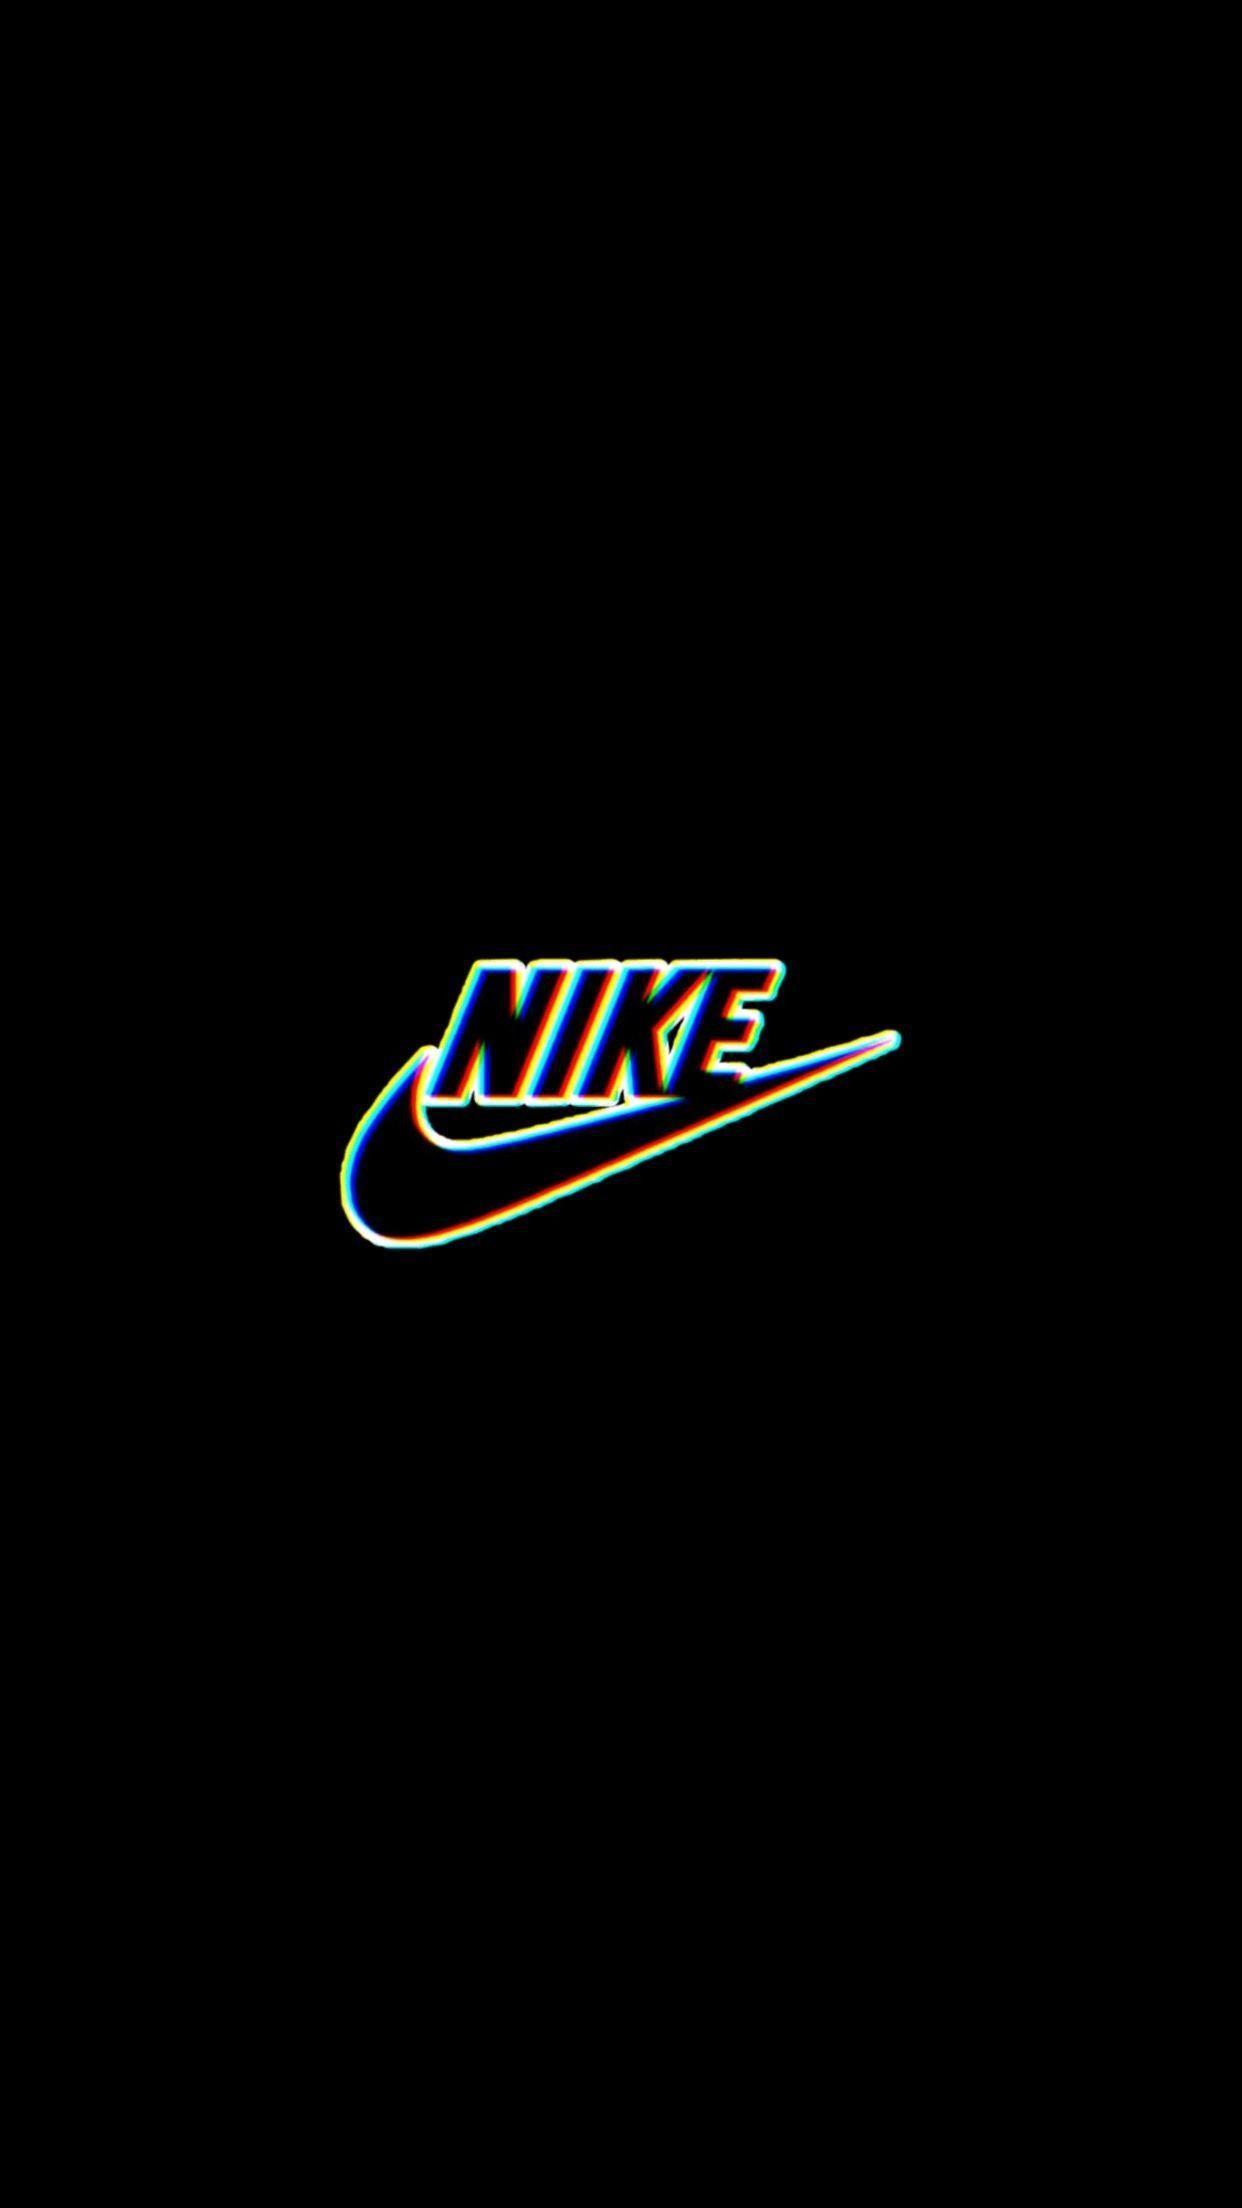 Aesthetic Nike Wallpapers Top Free Aesthetic Nike Backgrounds